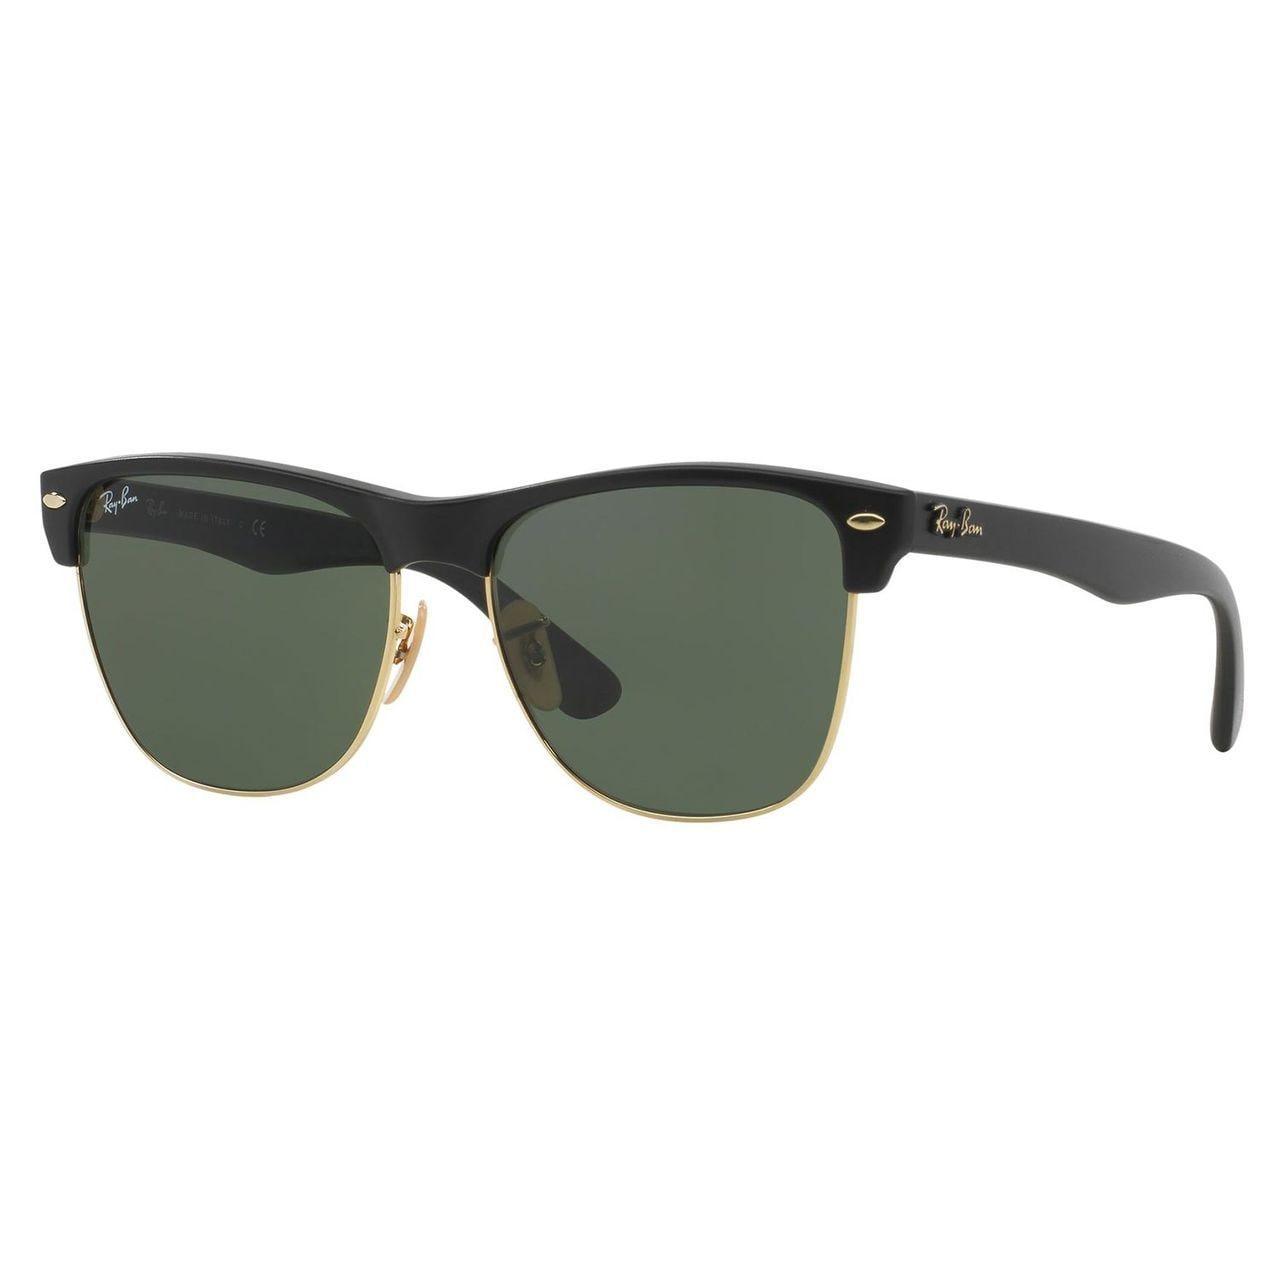 bea0faa2acae Shop Ray-Ban Women s  Clubmaster  Matte Black Wayfarer Sunglasses ...